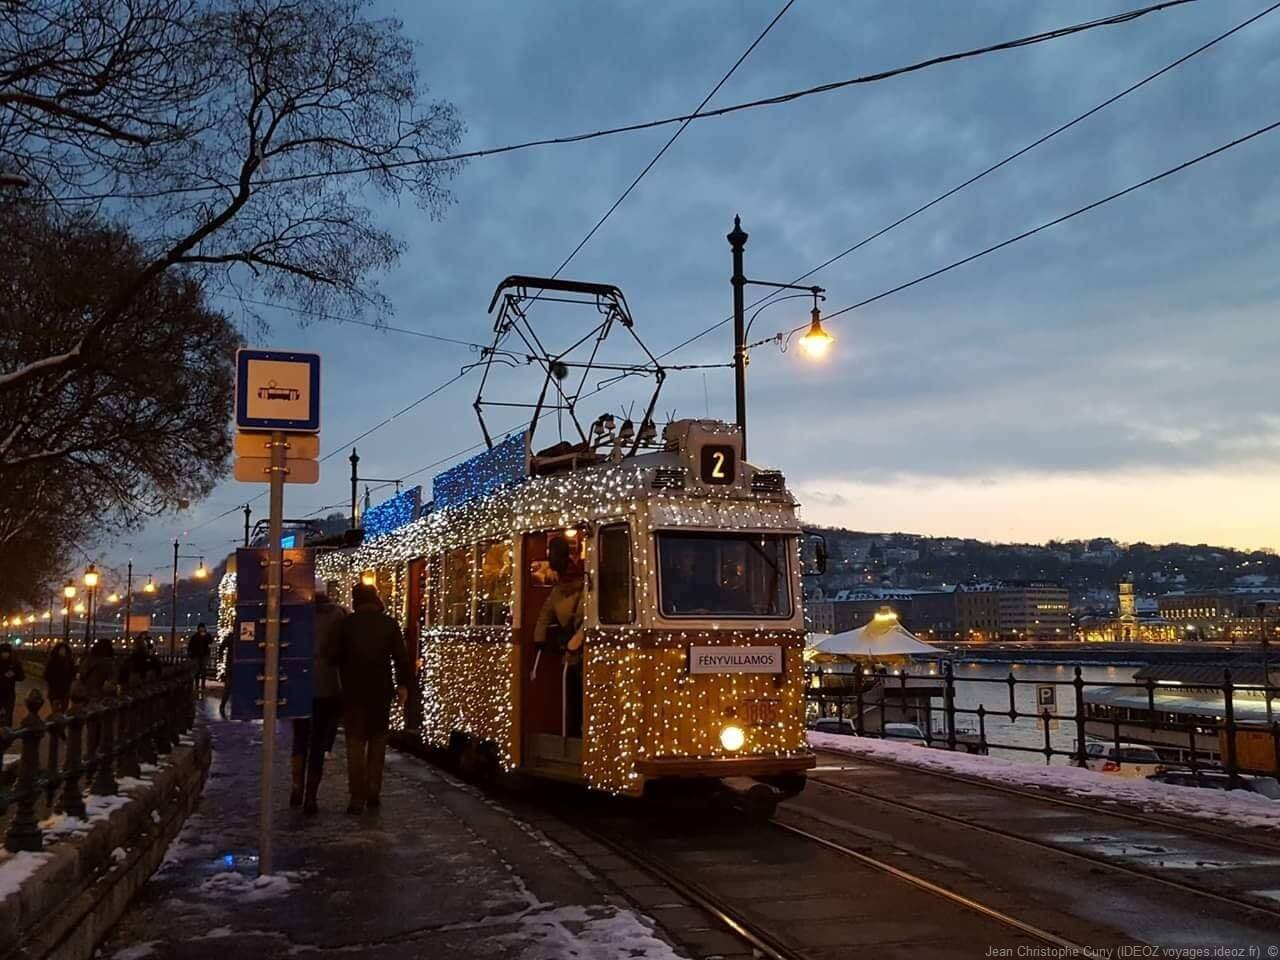 Tramway de Noel illuminé à Budapest Fenyvillamos